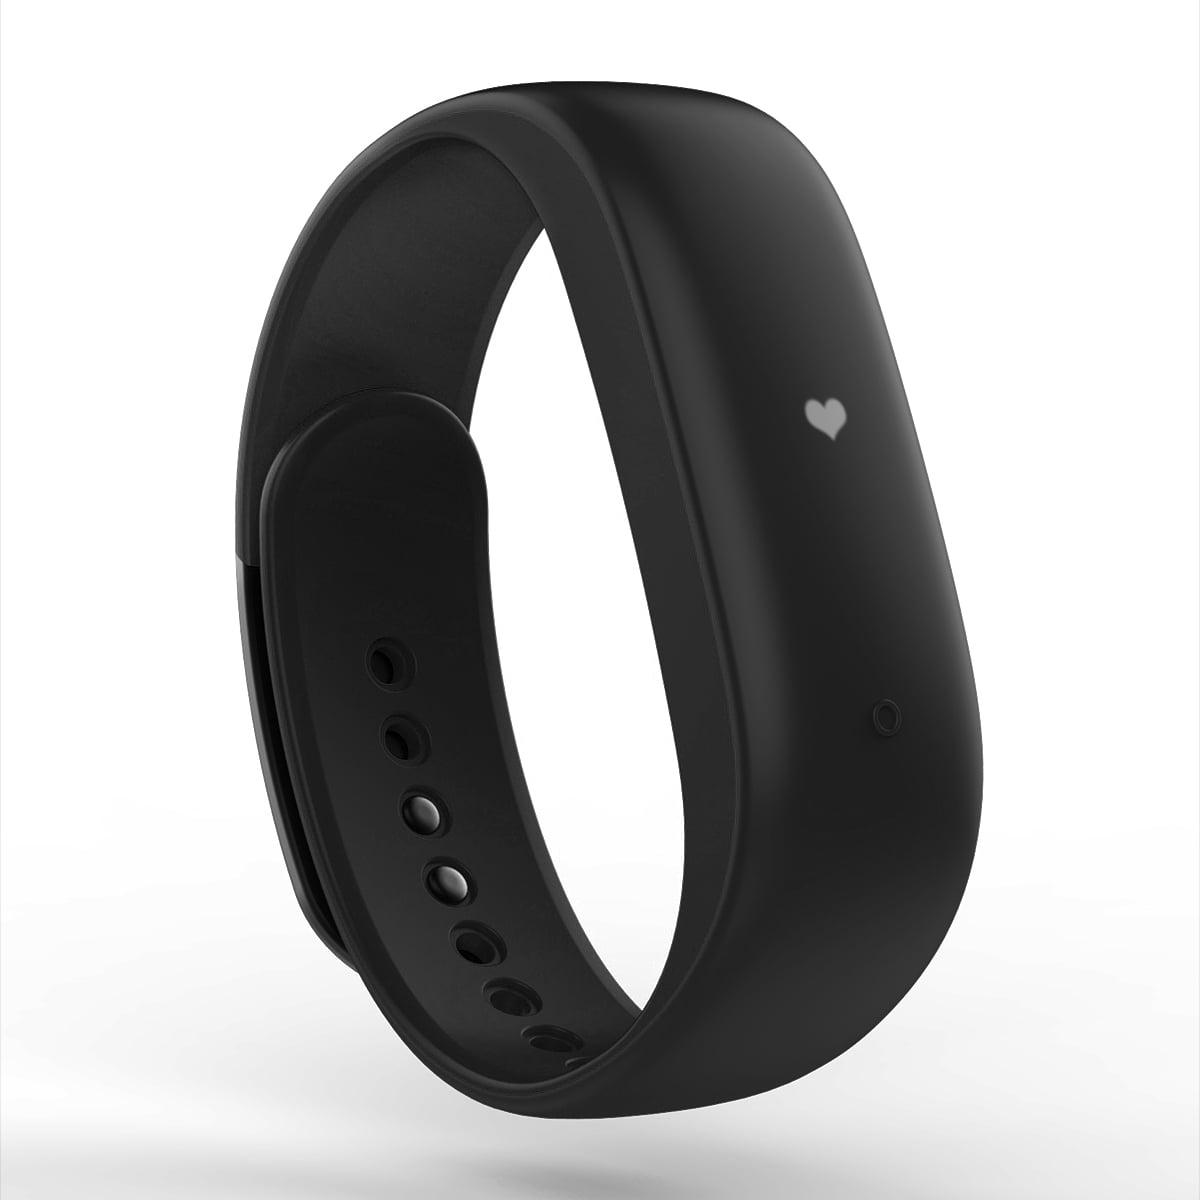 Lenovo HW02 Smart Bracelet Wristband Bluetooth 4.2 Heart Rate Moniter IP67 Pedometer Calling Message Reminder